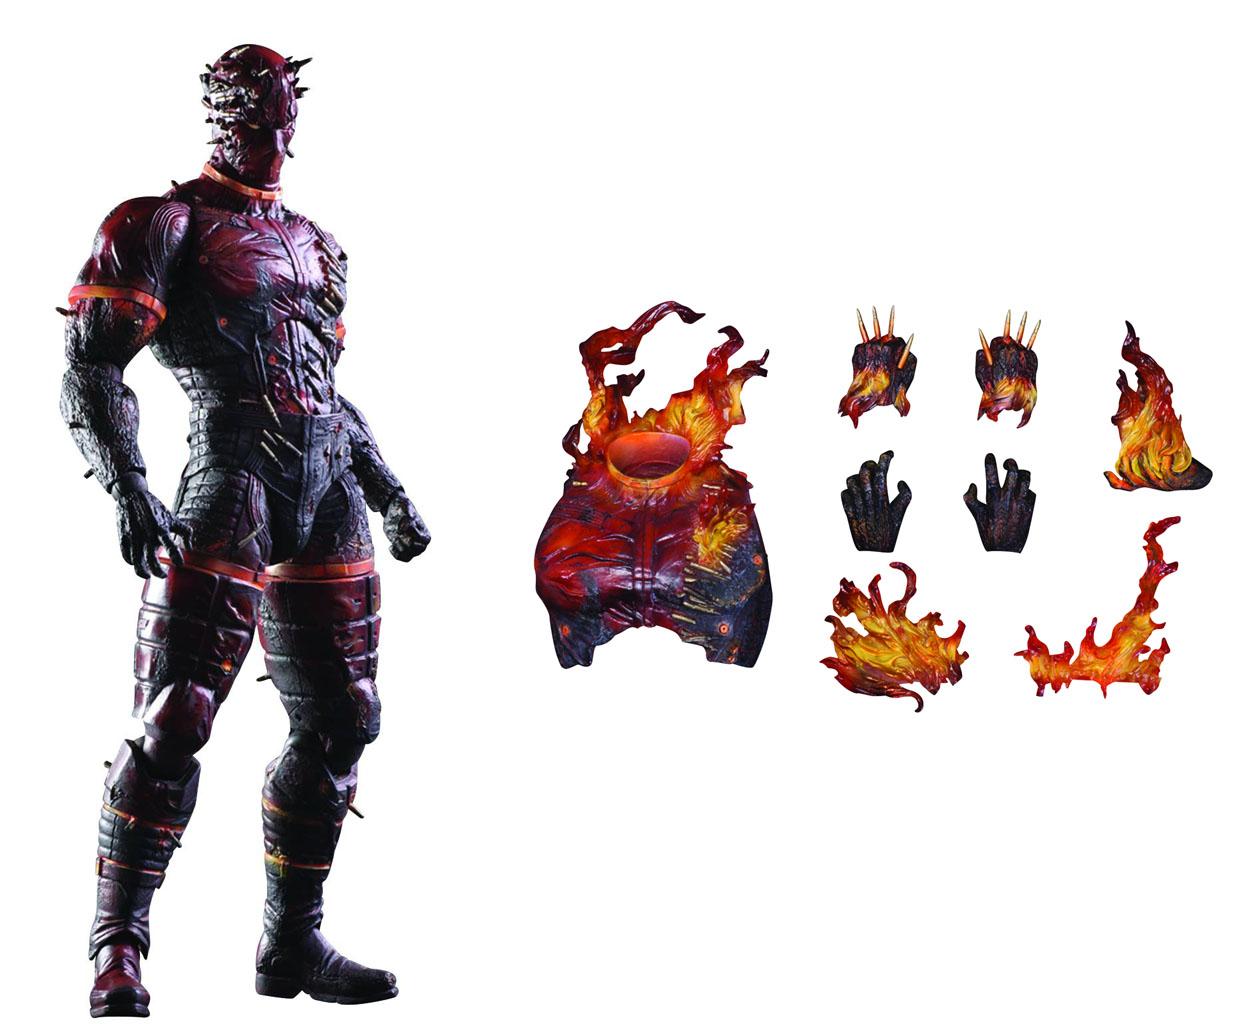 Metal Geaer Solid Phantom Pain: Kai Man on Fire Action Figure